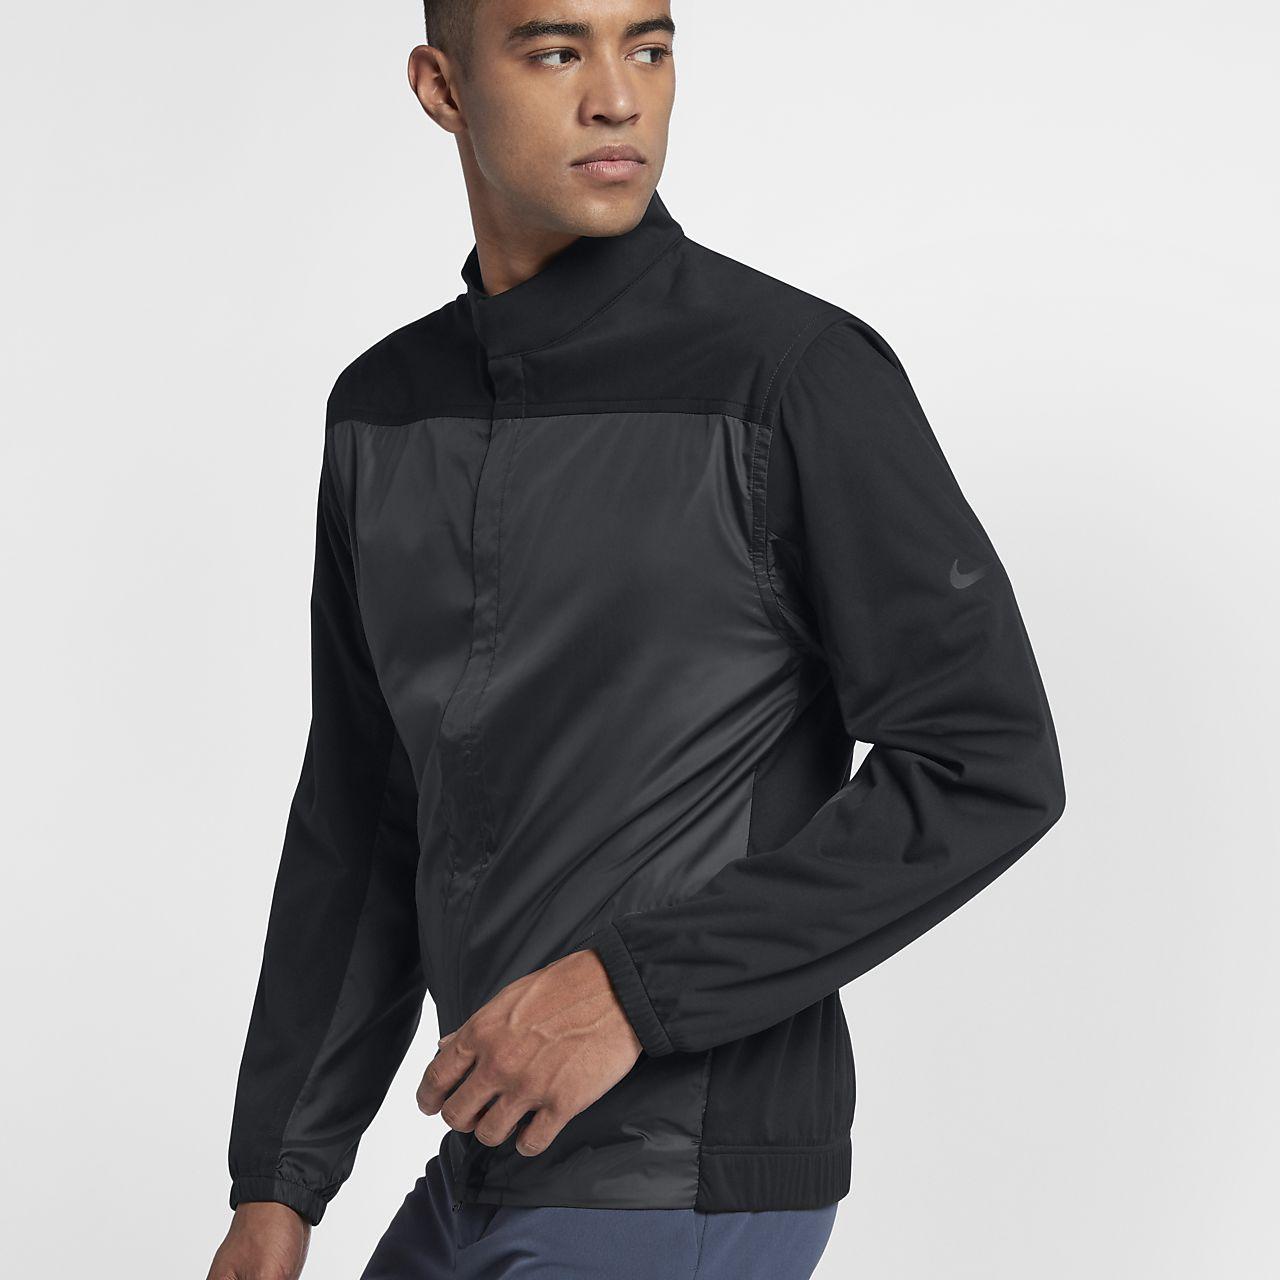 e055d944c323 Nike Shield Men s Full-Zip Golf Jacket. Nike.com